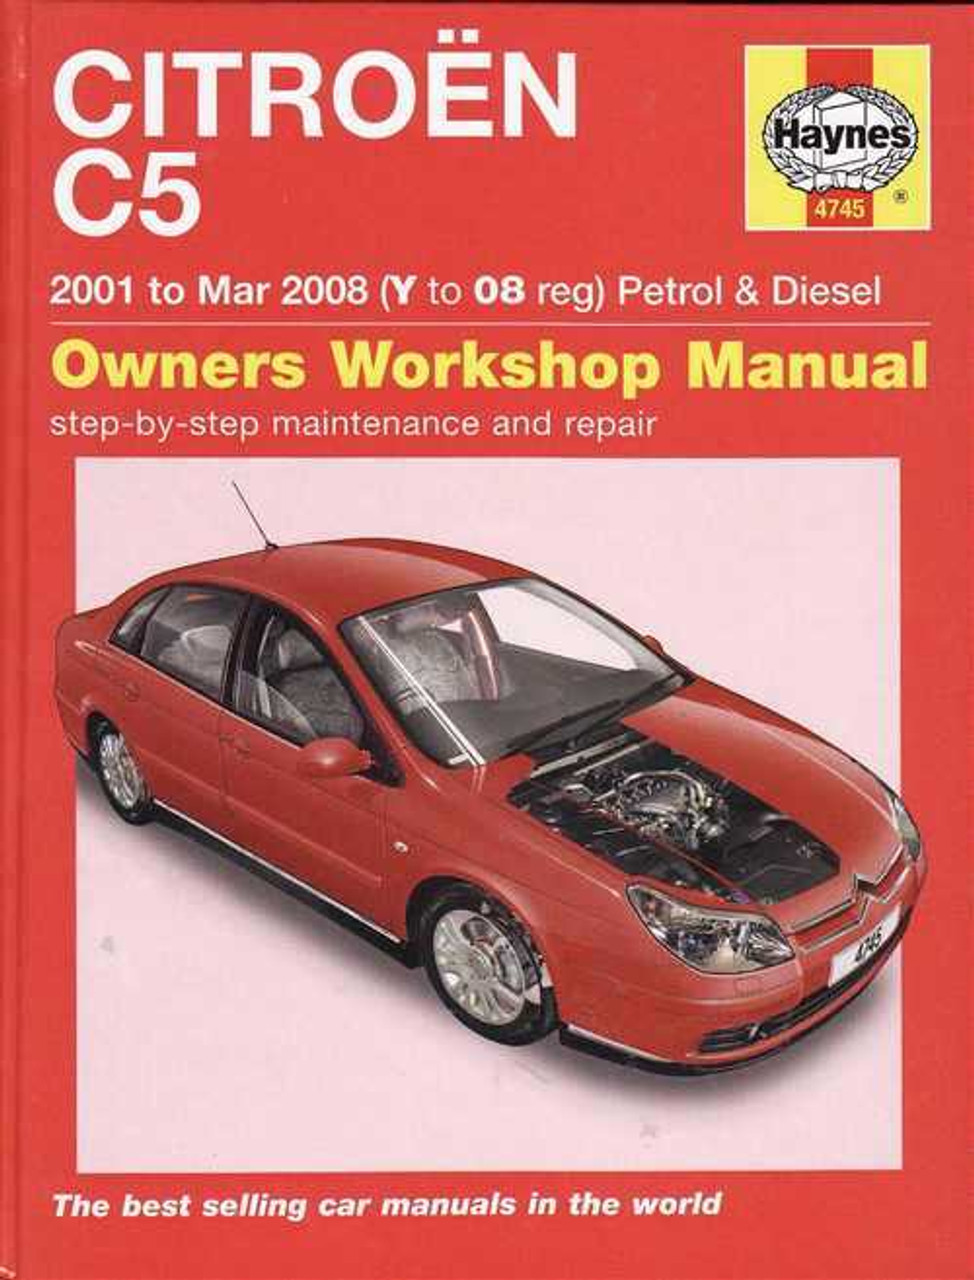 citroen c5 2001 2008 petrol amp diesel workshop manual rh automotobookshop com au Citroen C3 Citroen C3